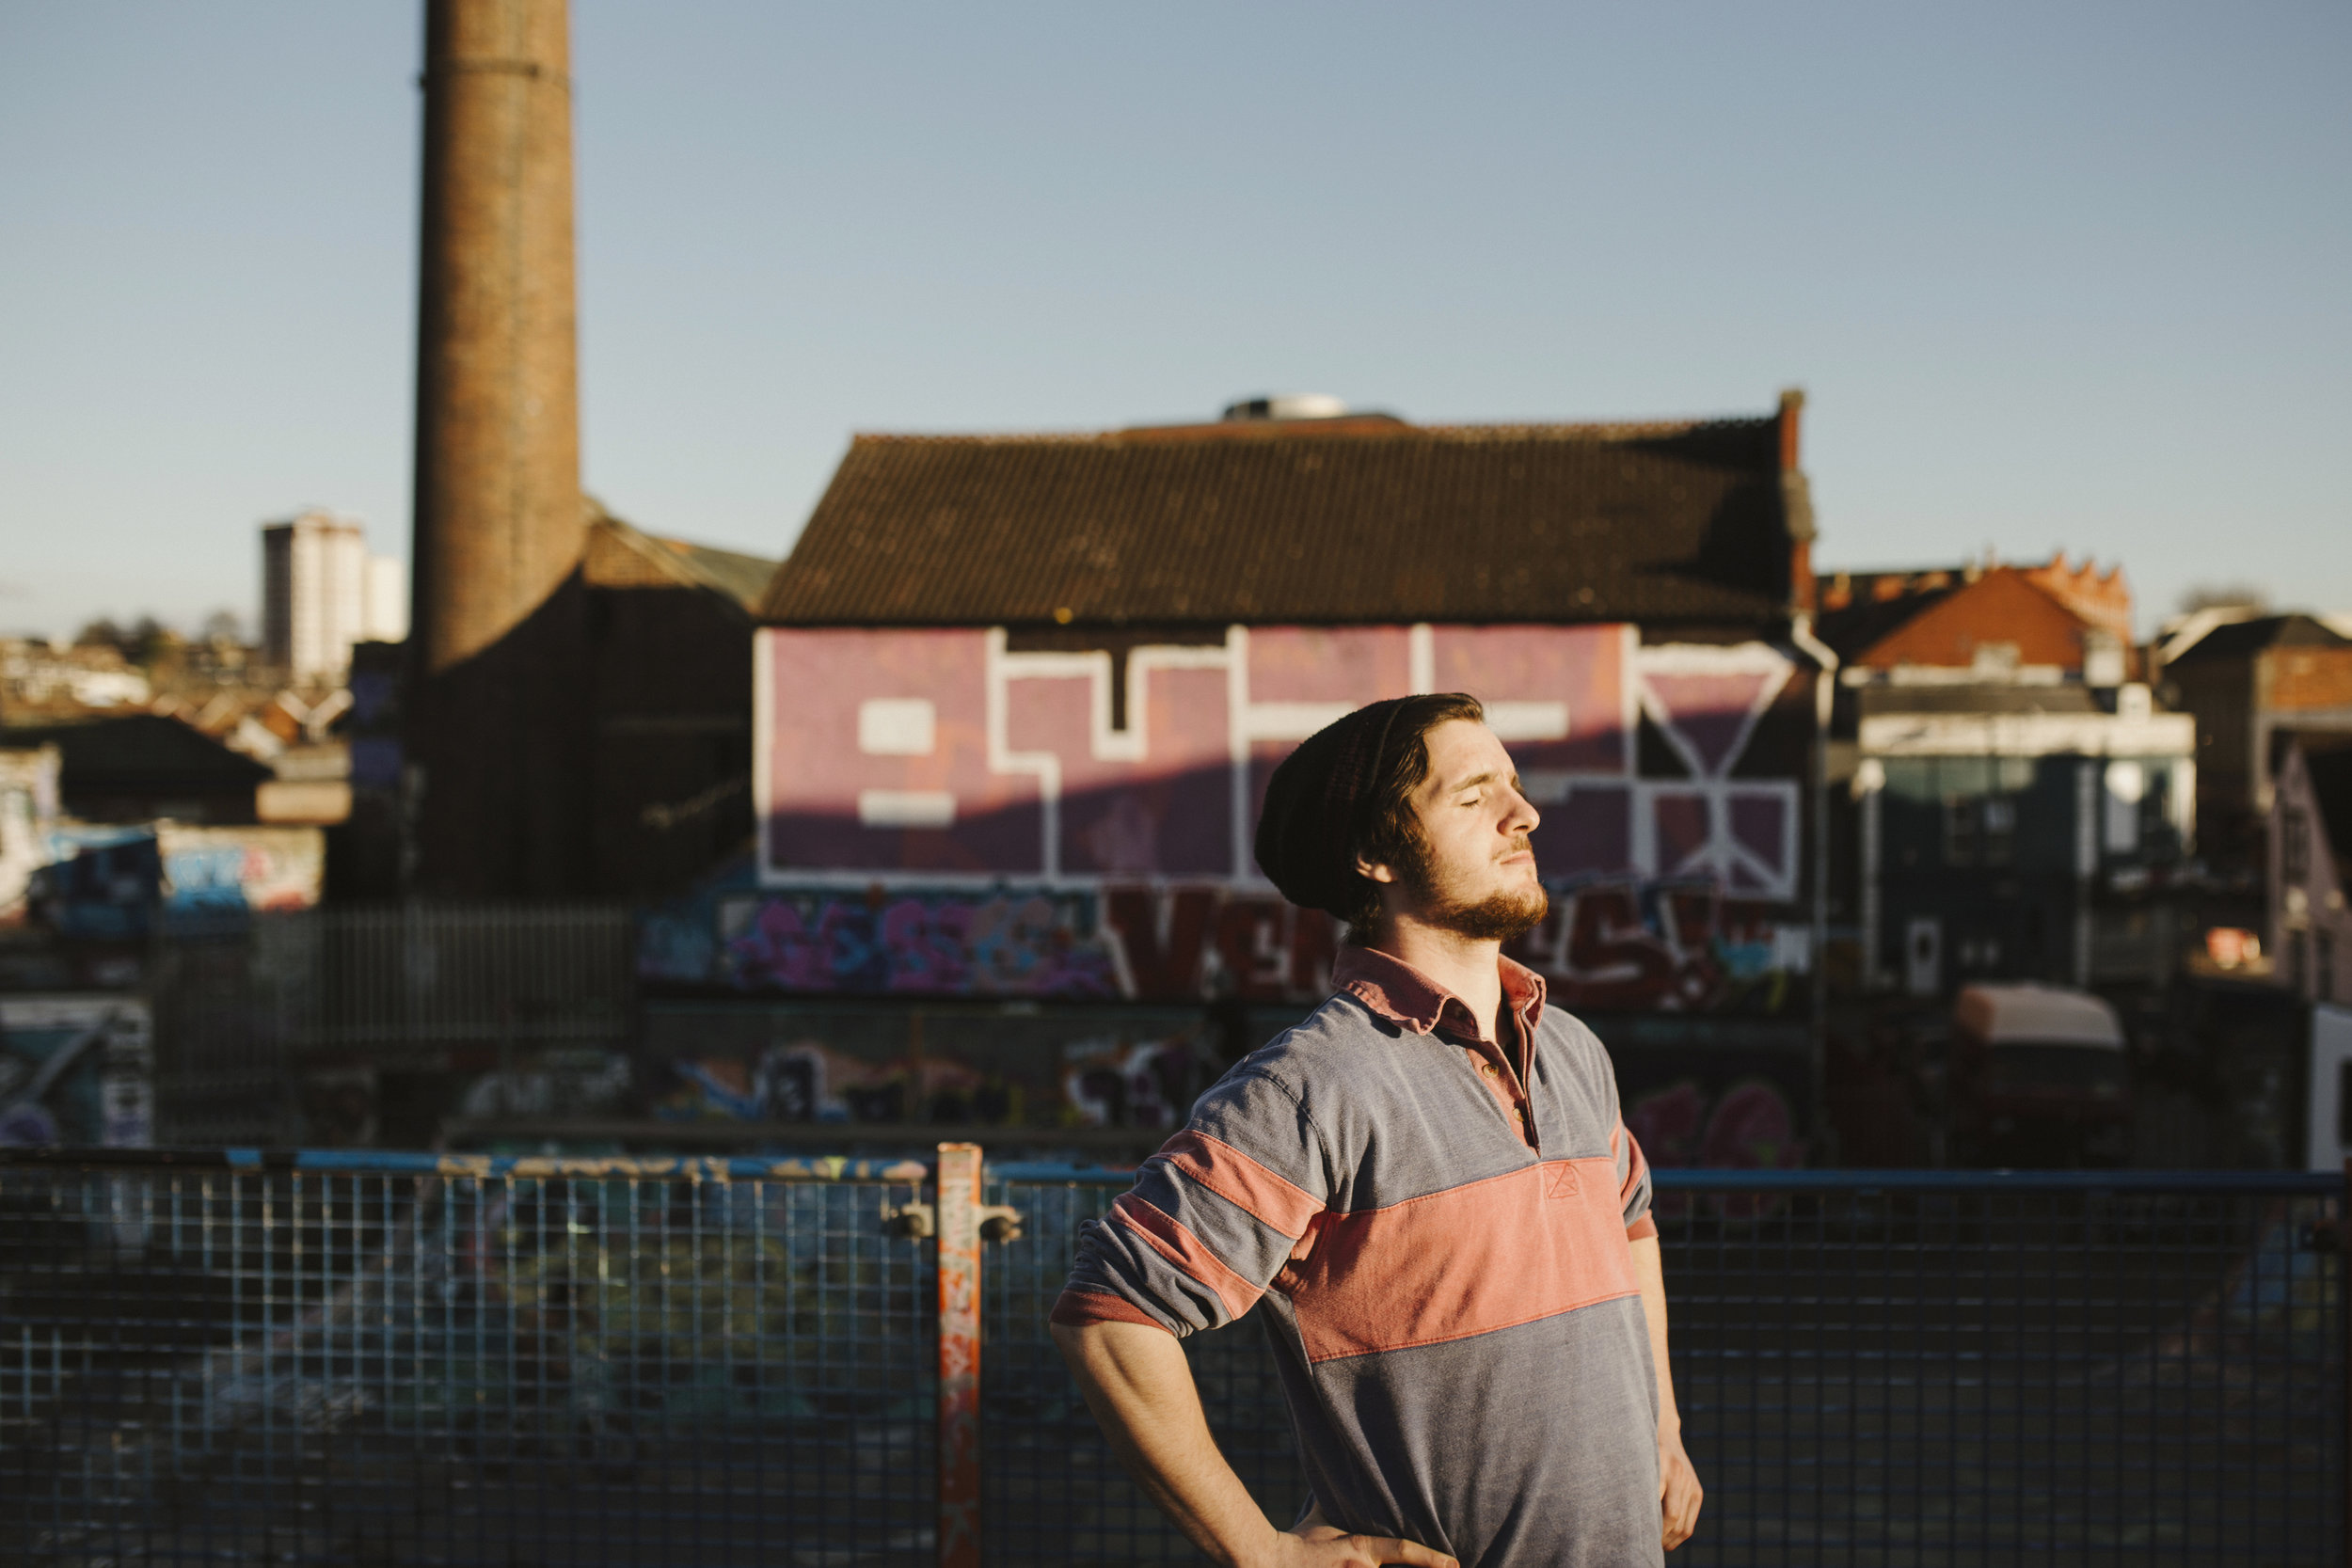 Keownphoto. Always Sunny In Bristol 1.JPG